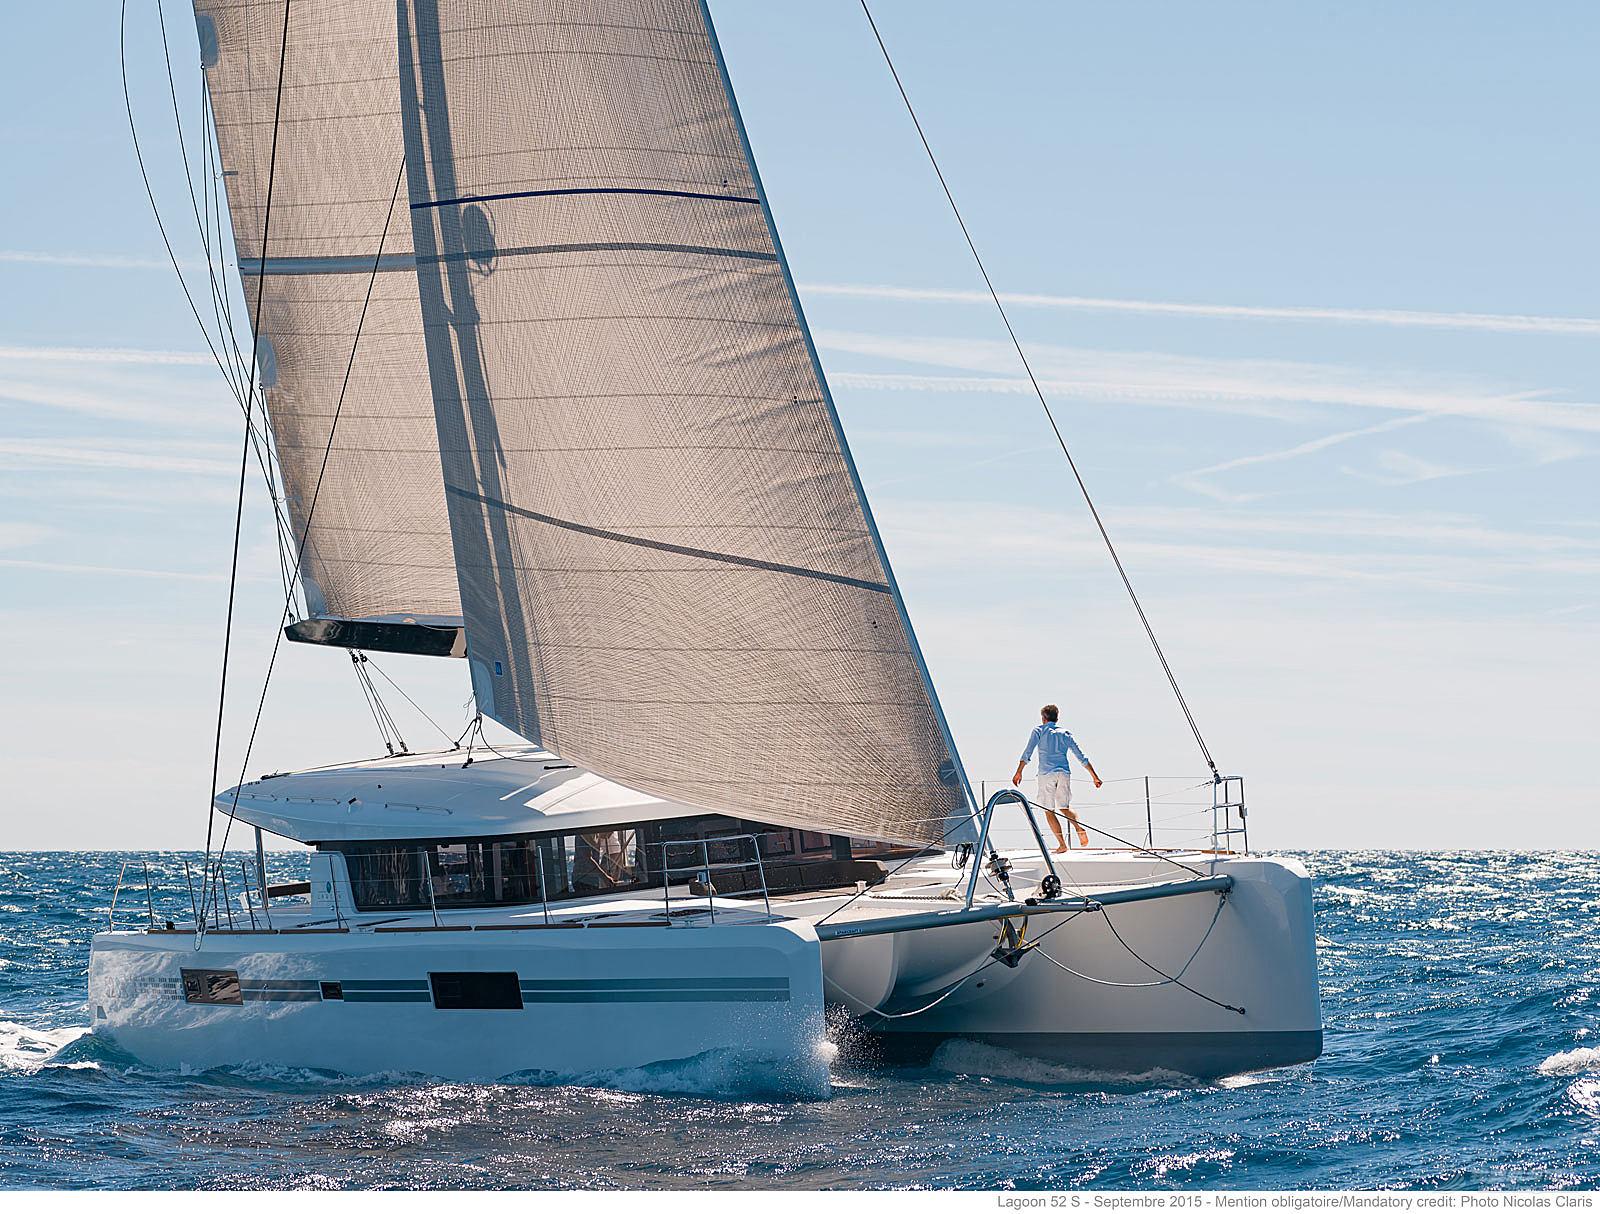 帆船 Lagoon 52S 蓝高52S双体帆船